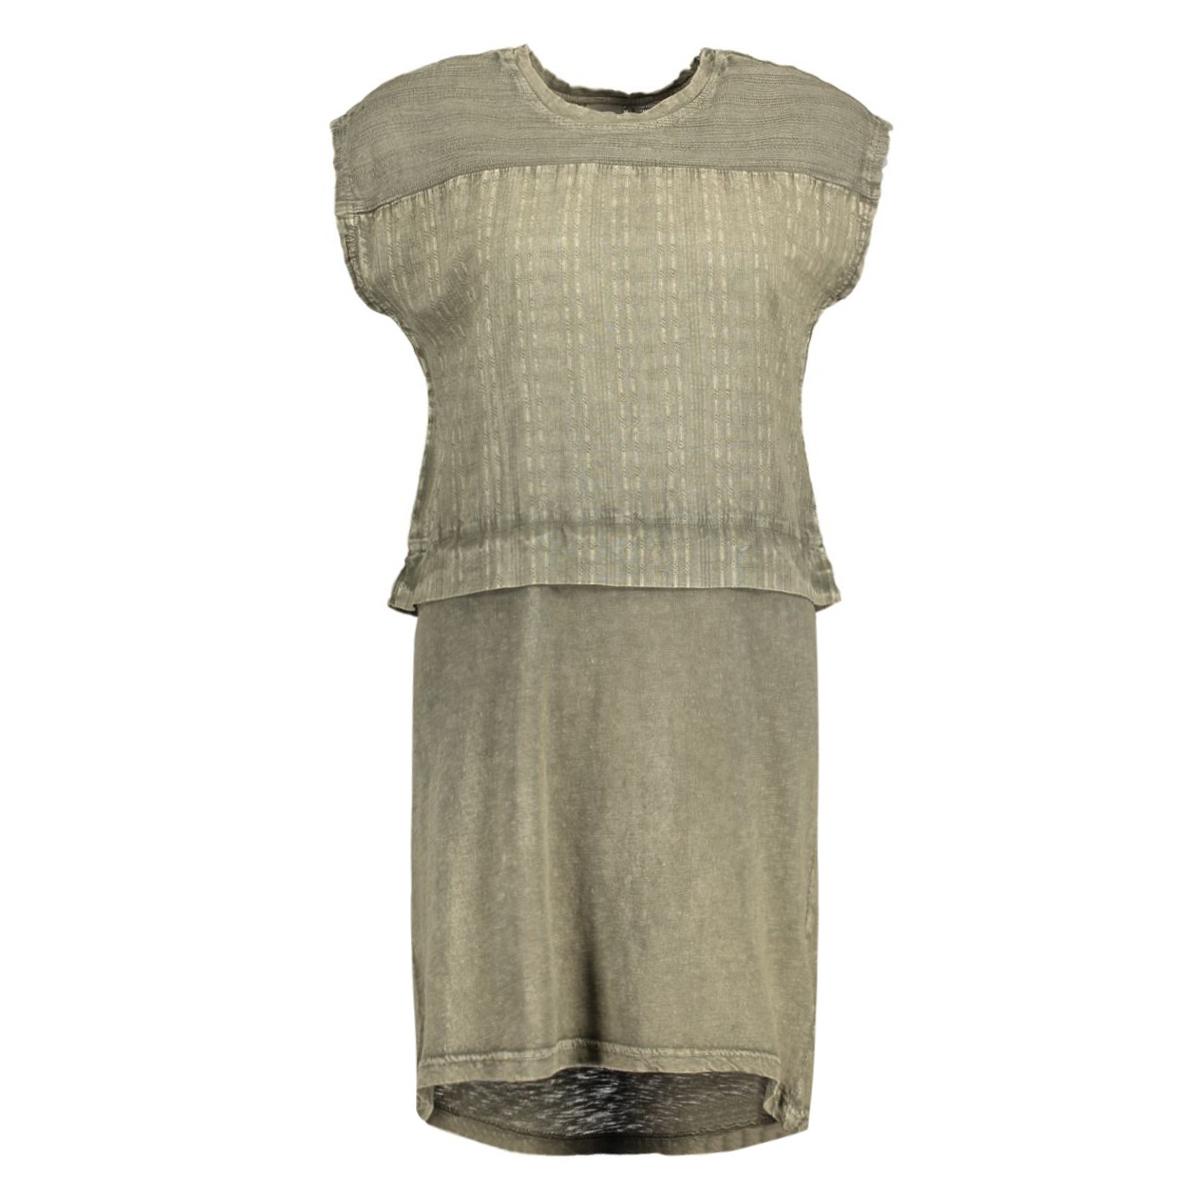 objsavannah knee dress 23022363 object jurk forest night